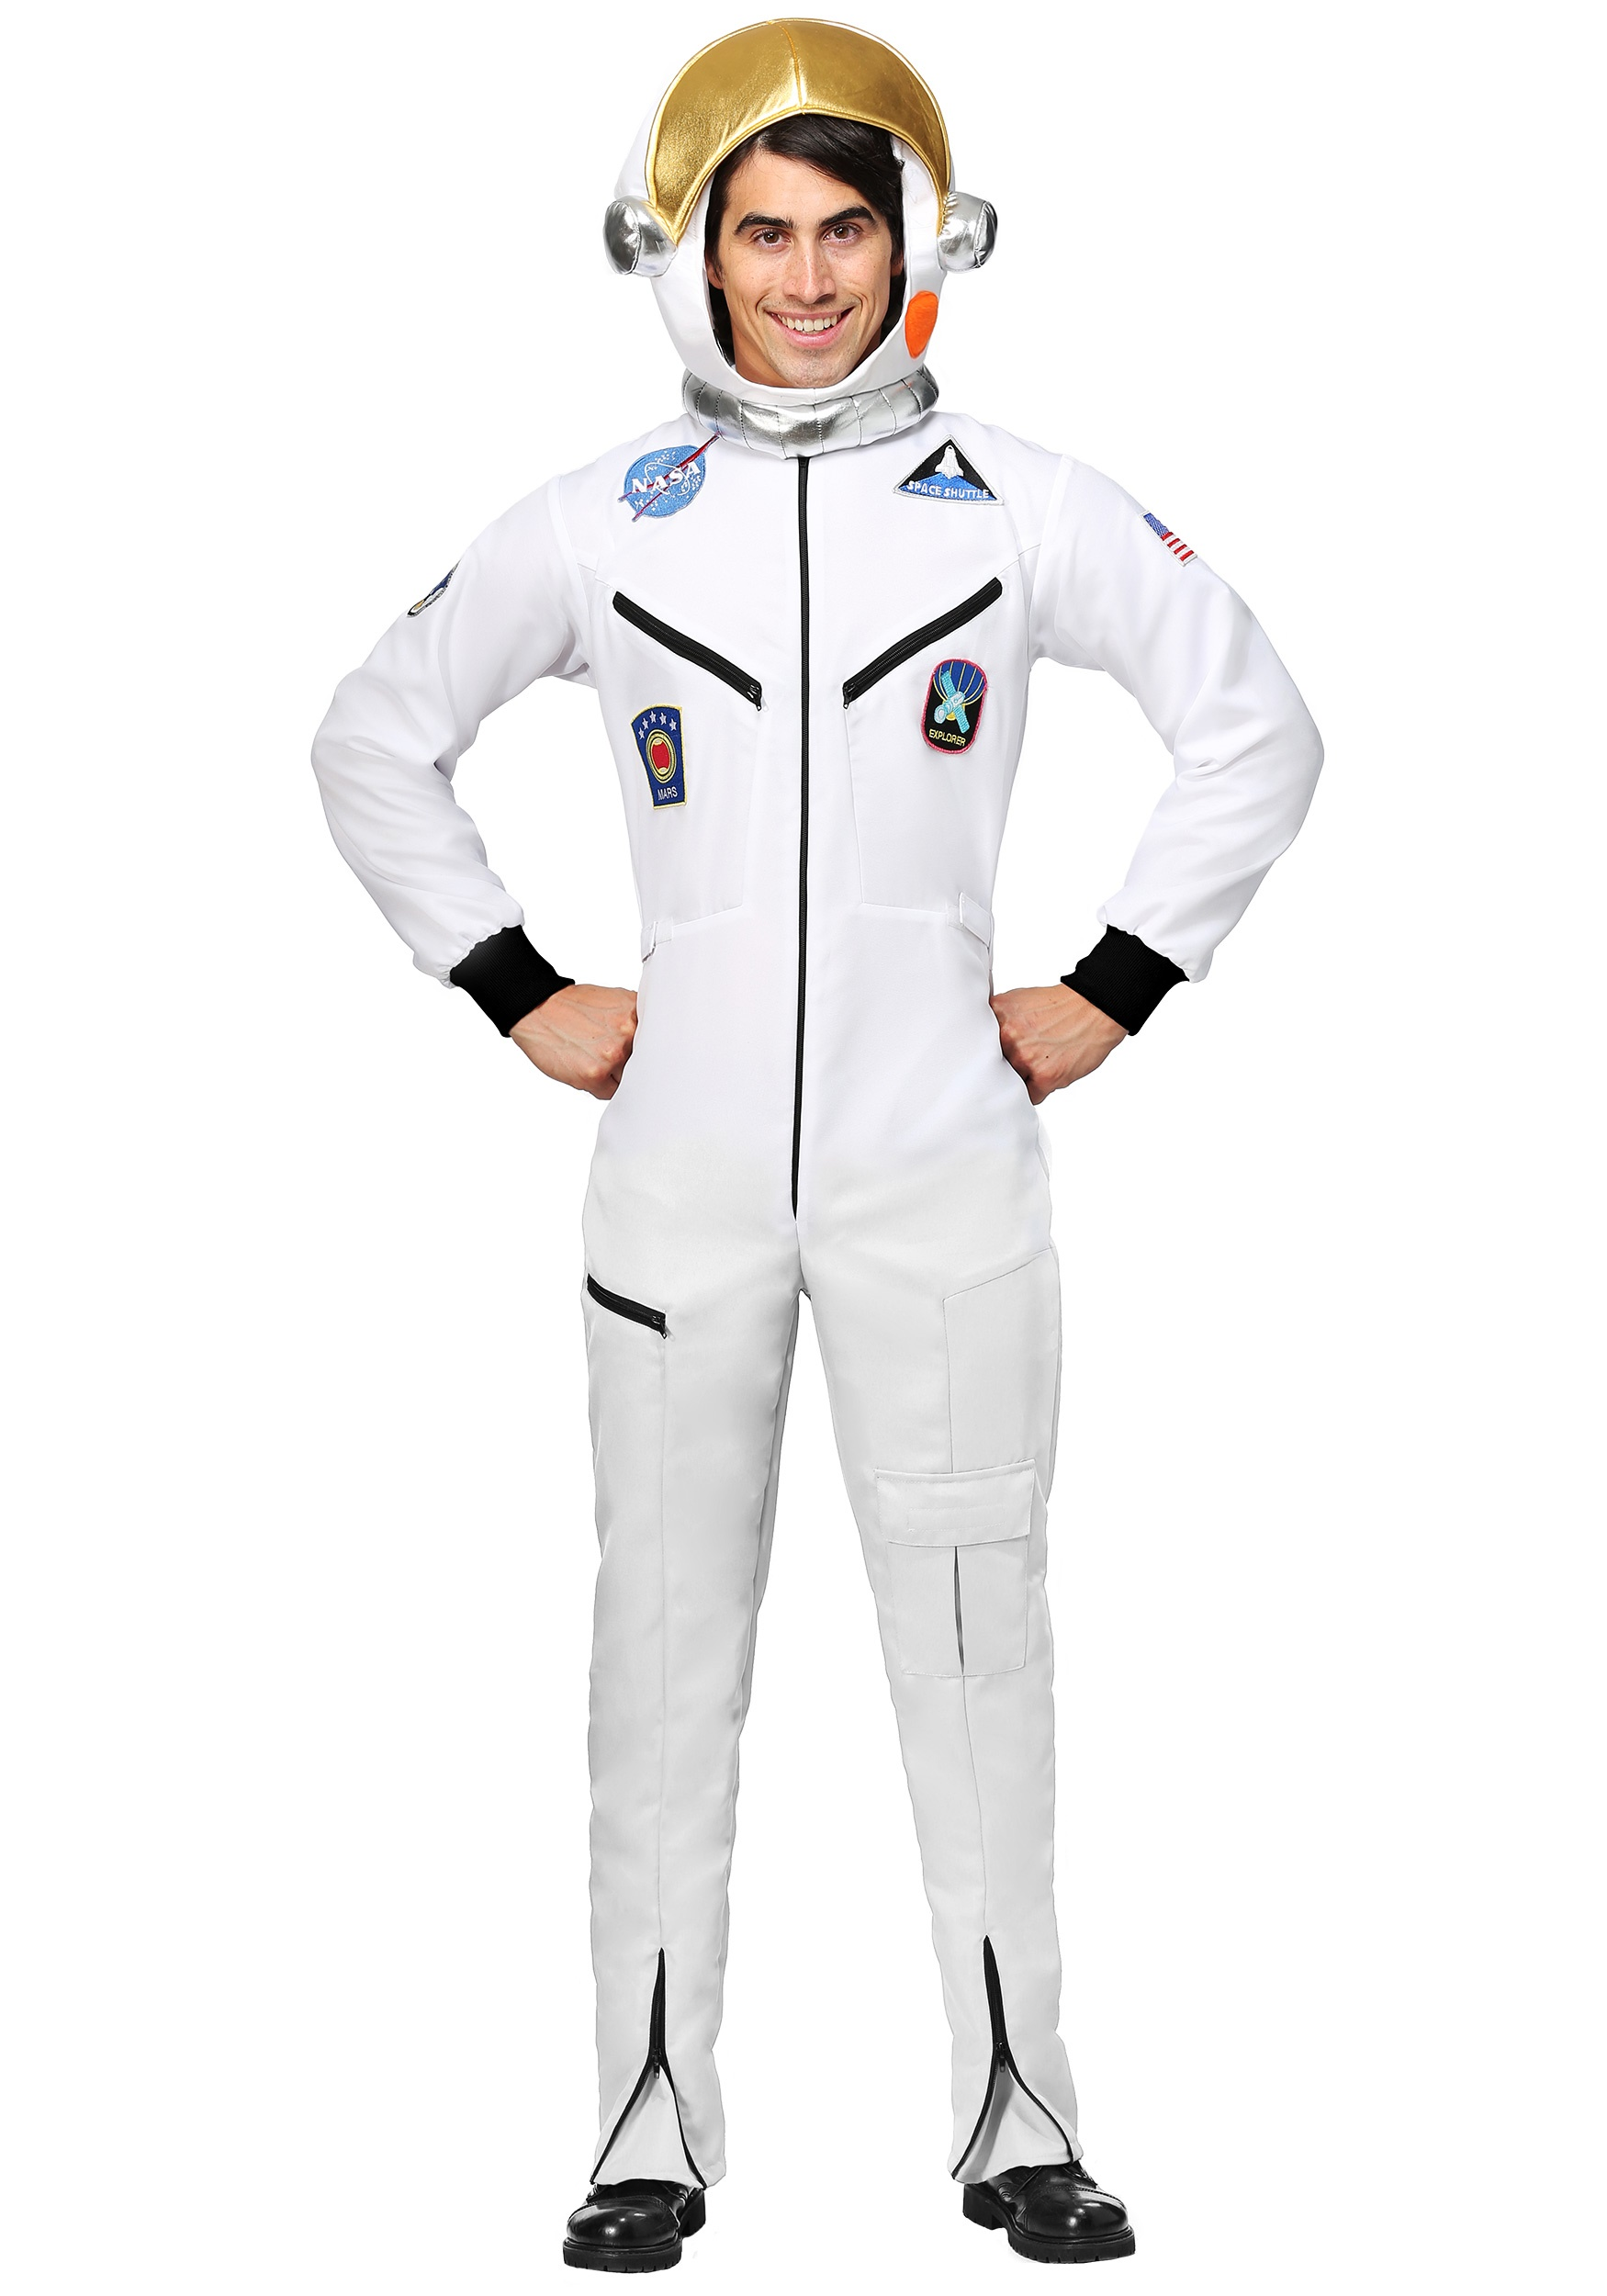 Astronaut Costumes Kids Adult Astronaut Halloween Costume